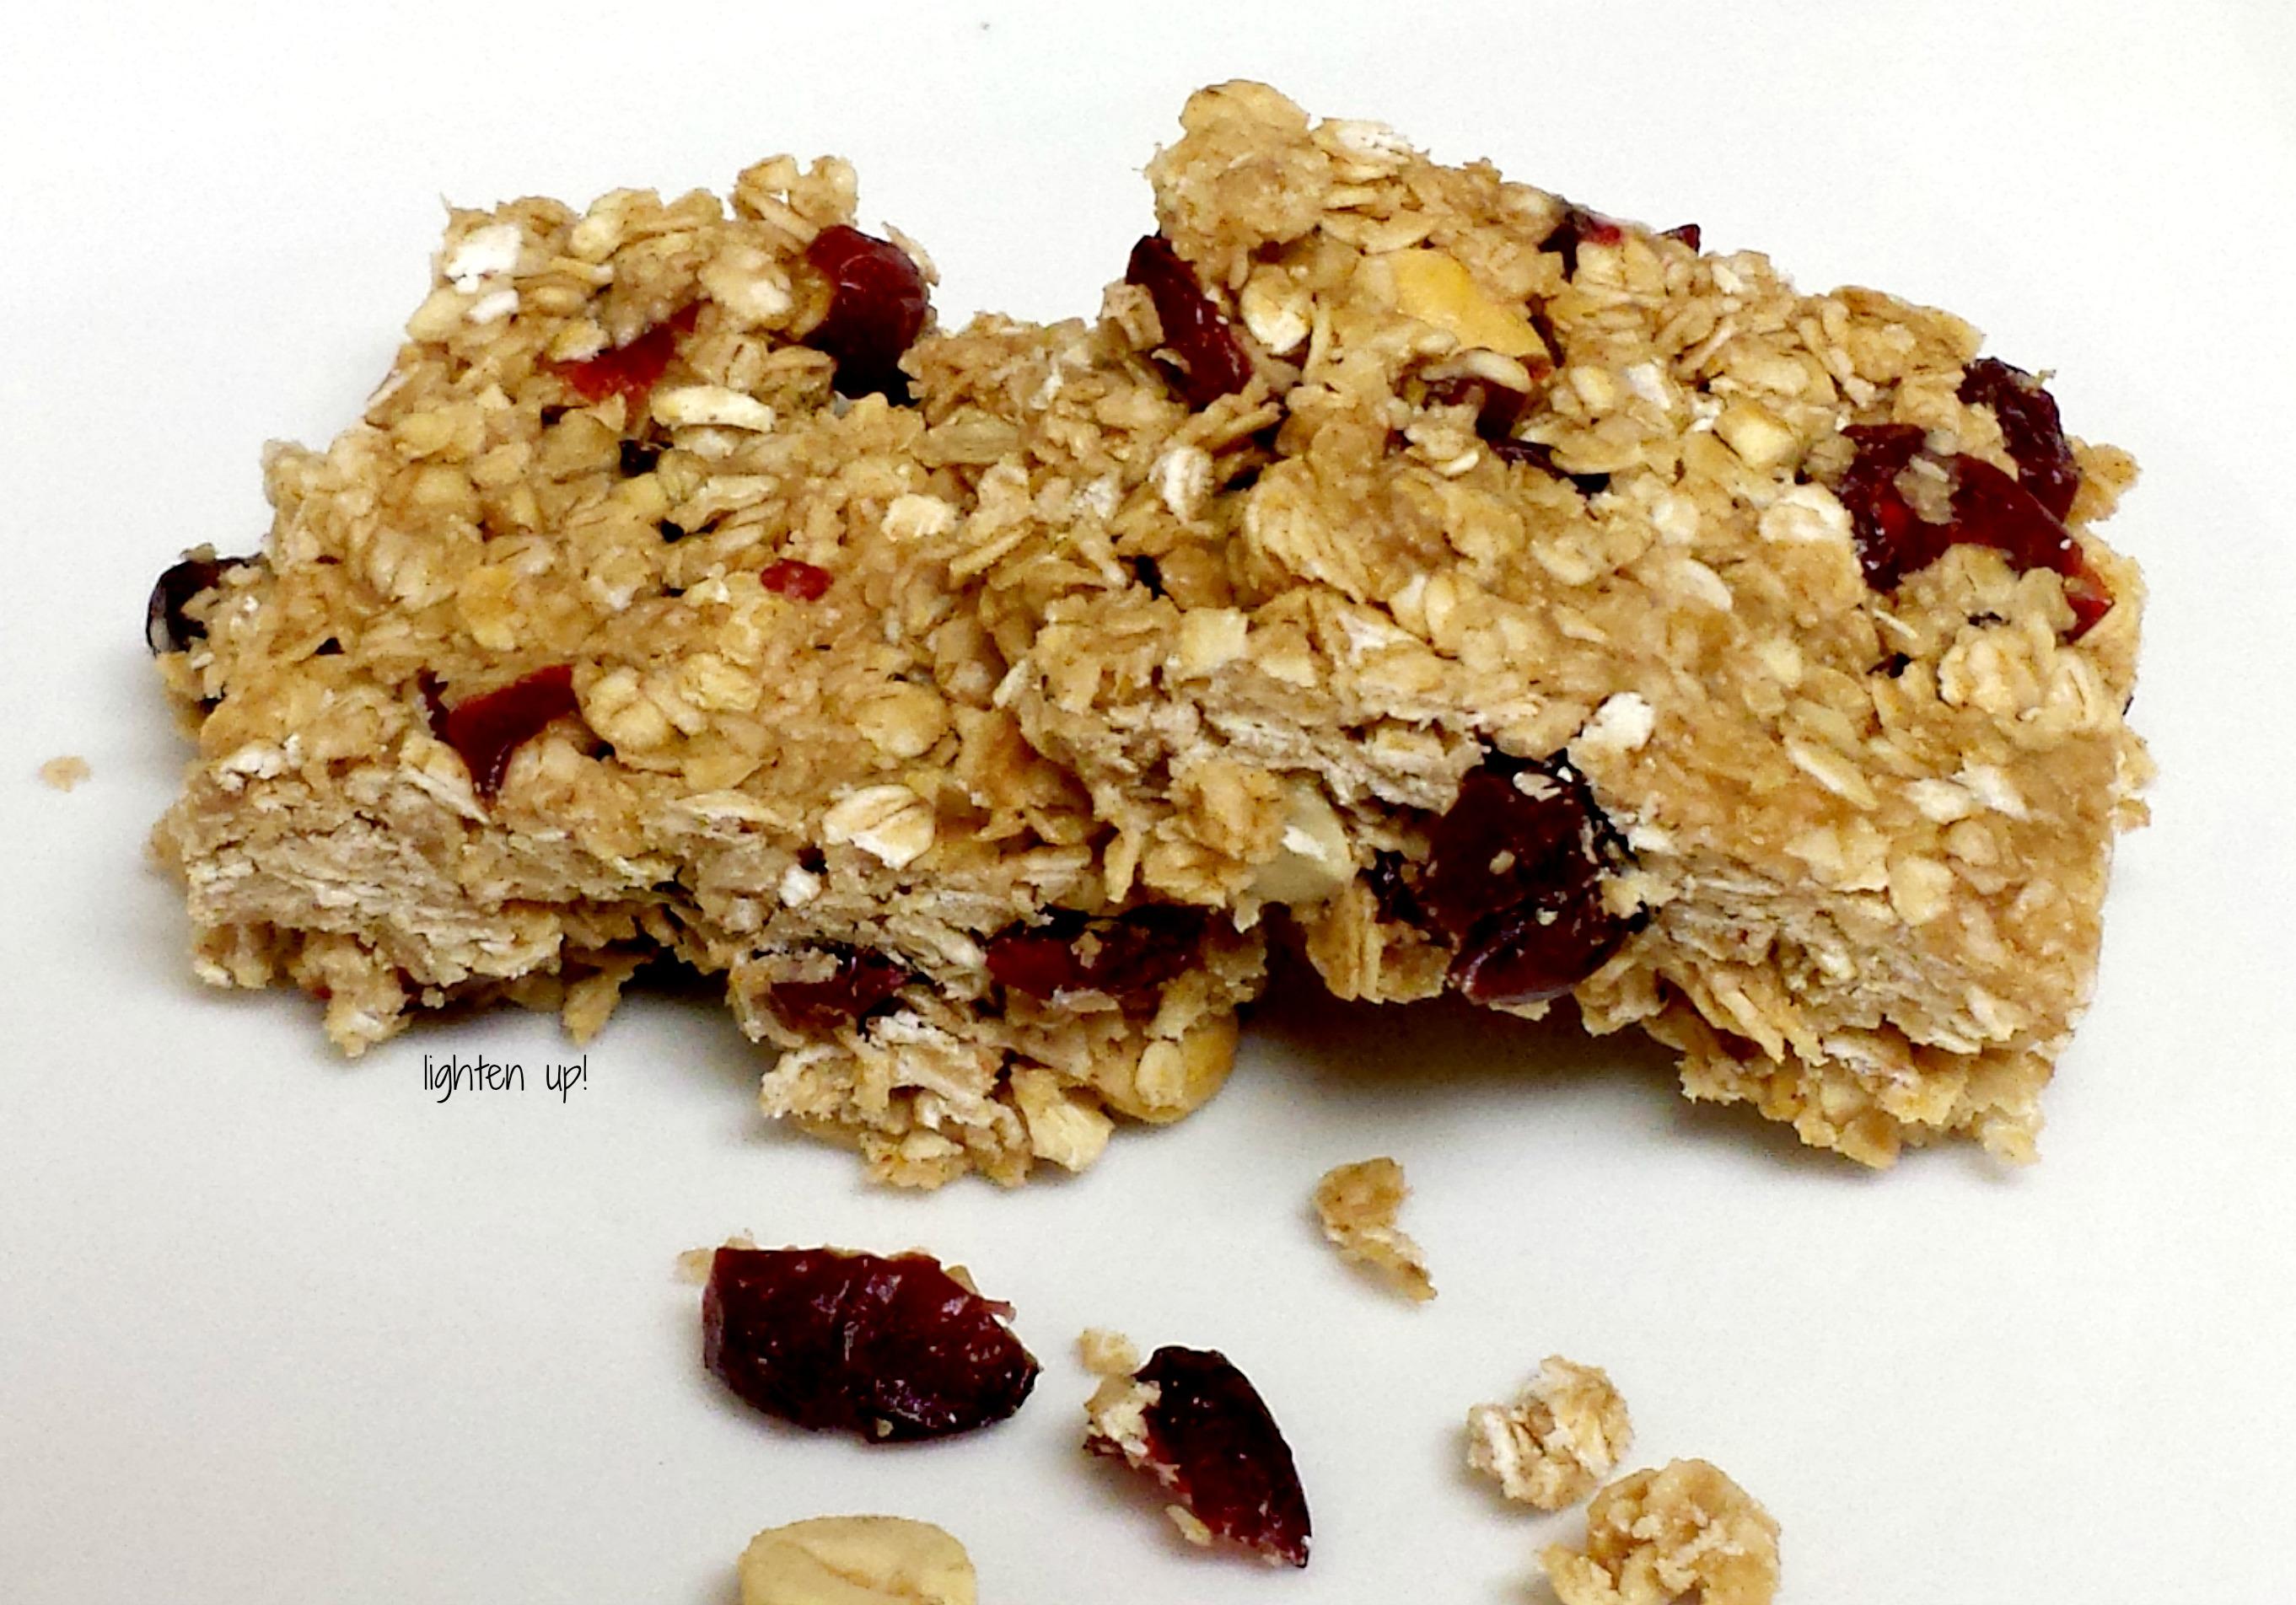 Homemade no-bake granola bars | Lighten Up!